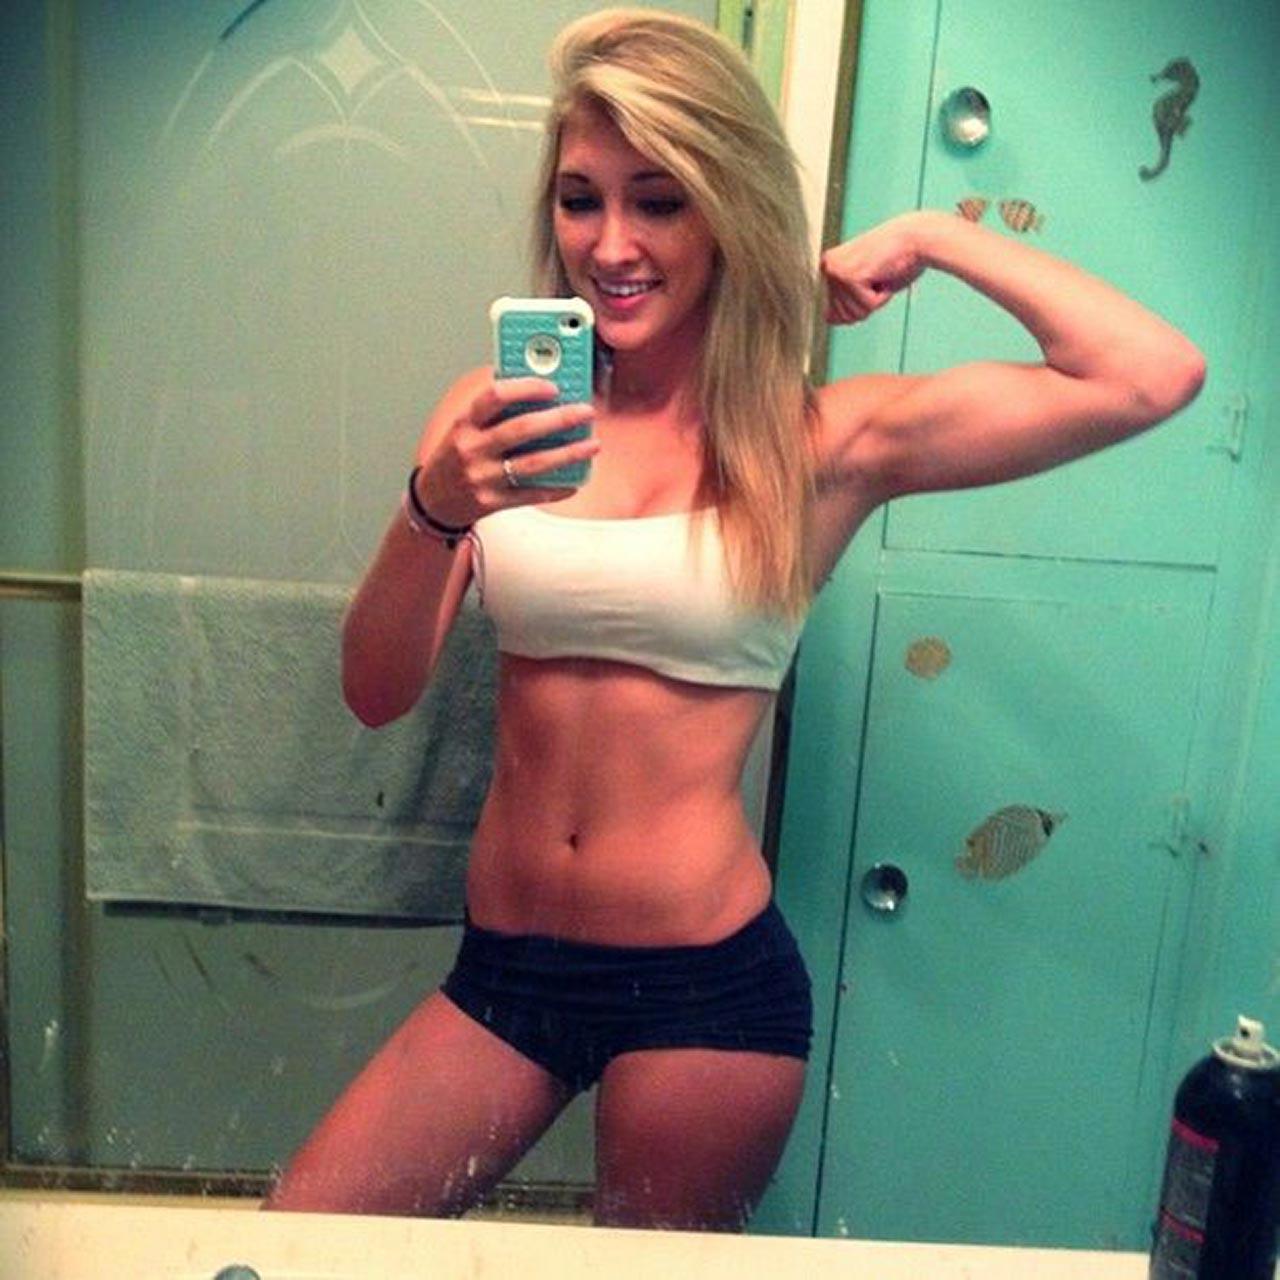 selfie pictures Anna faith nude